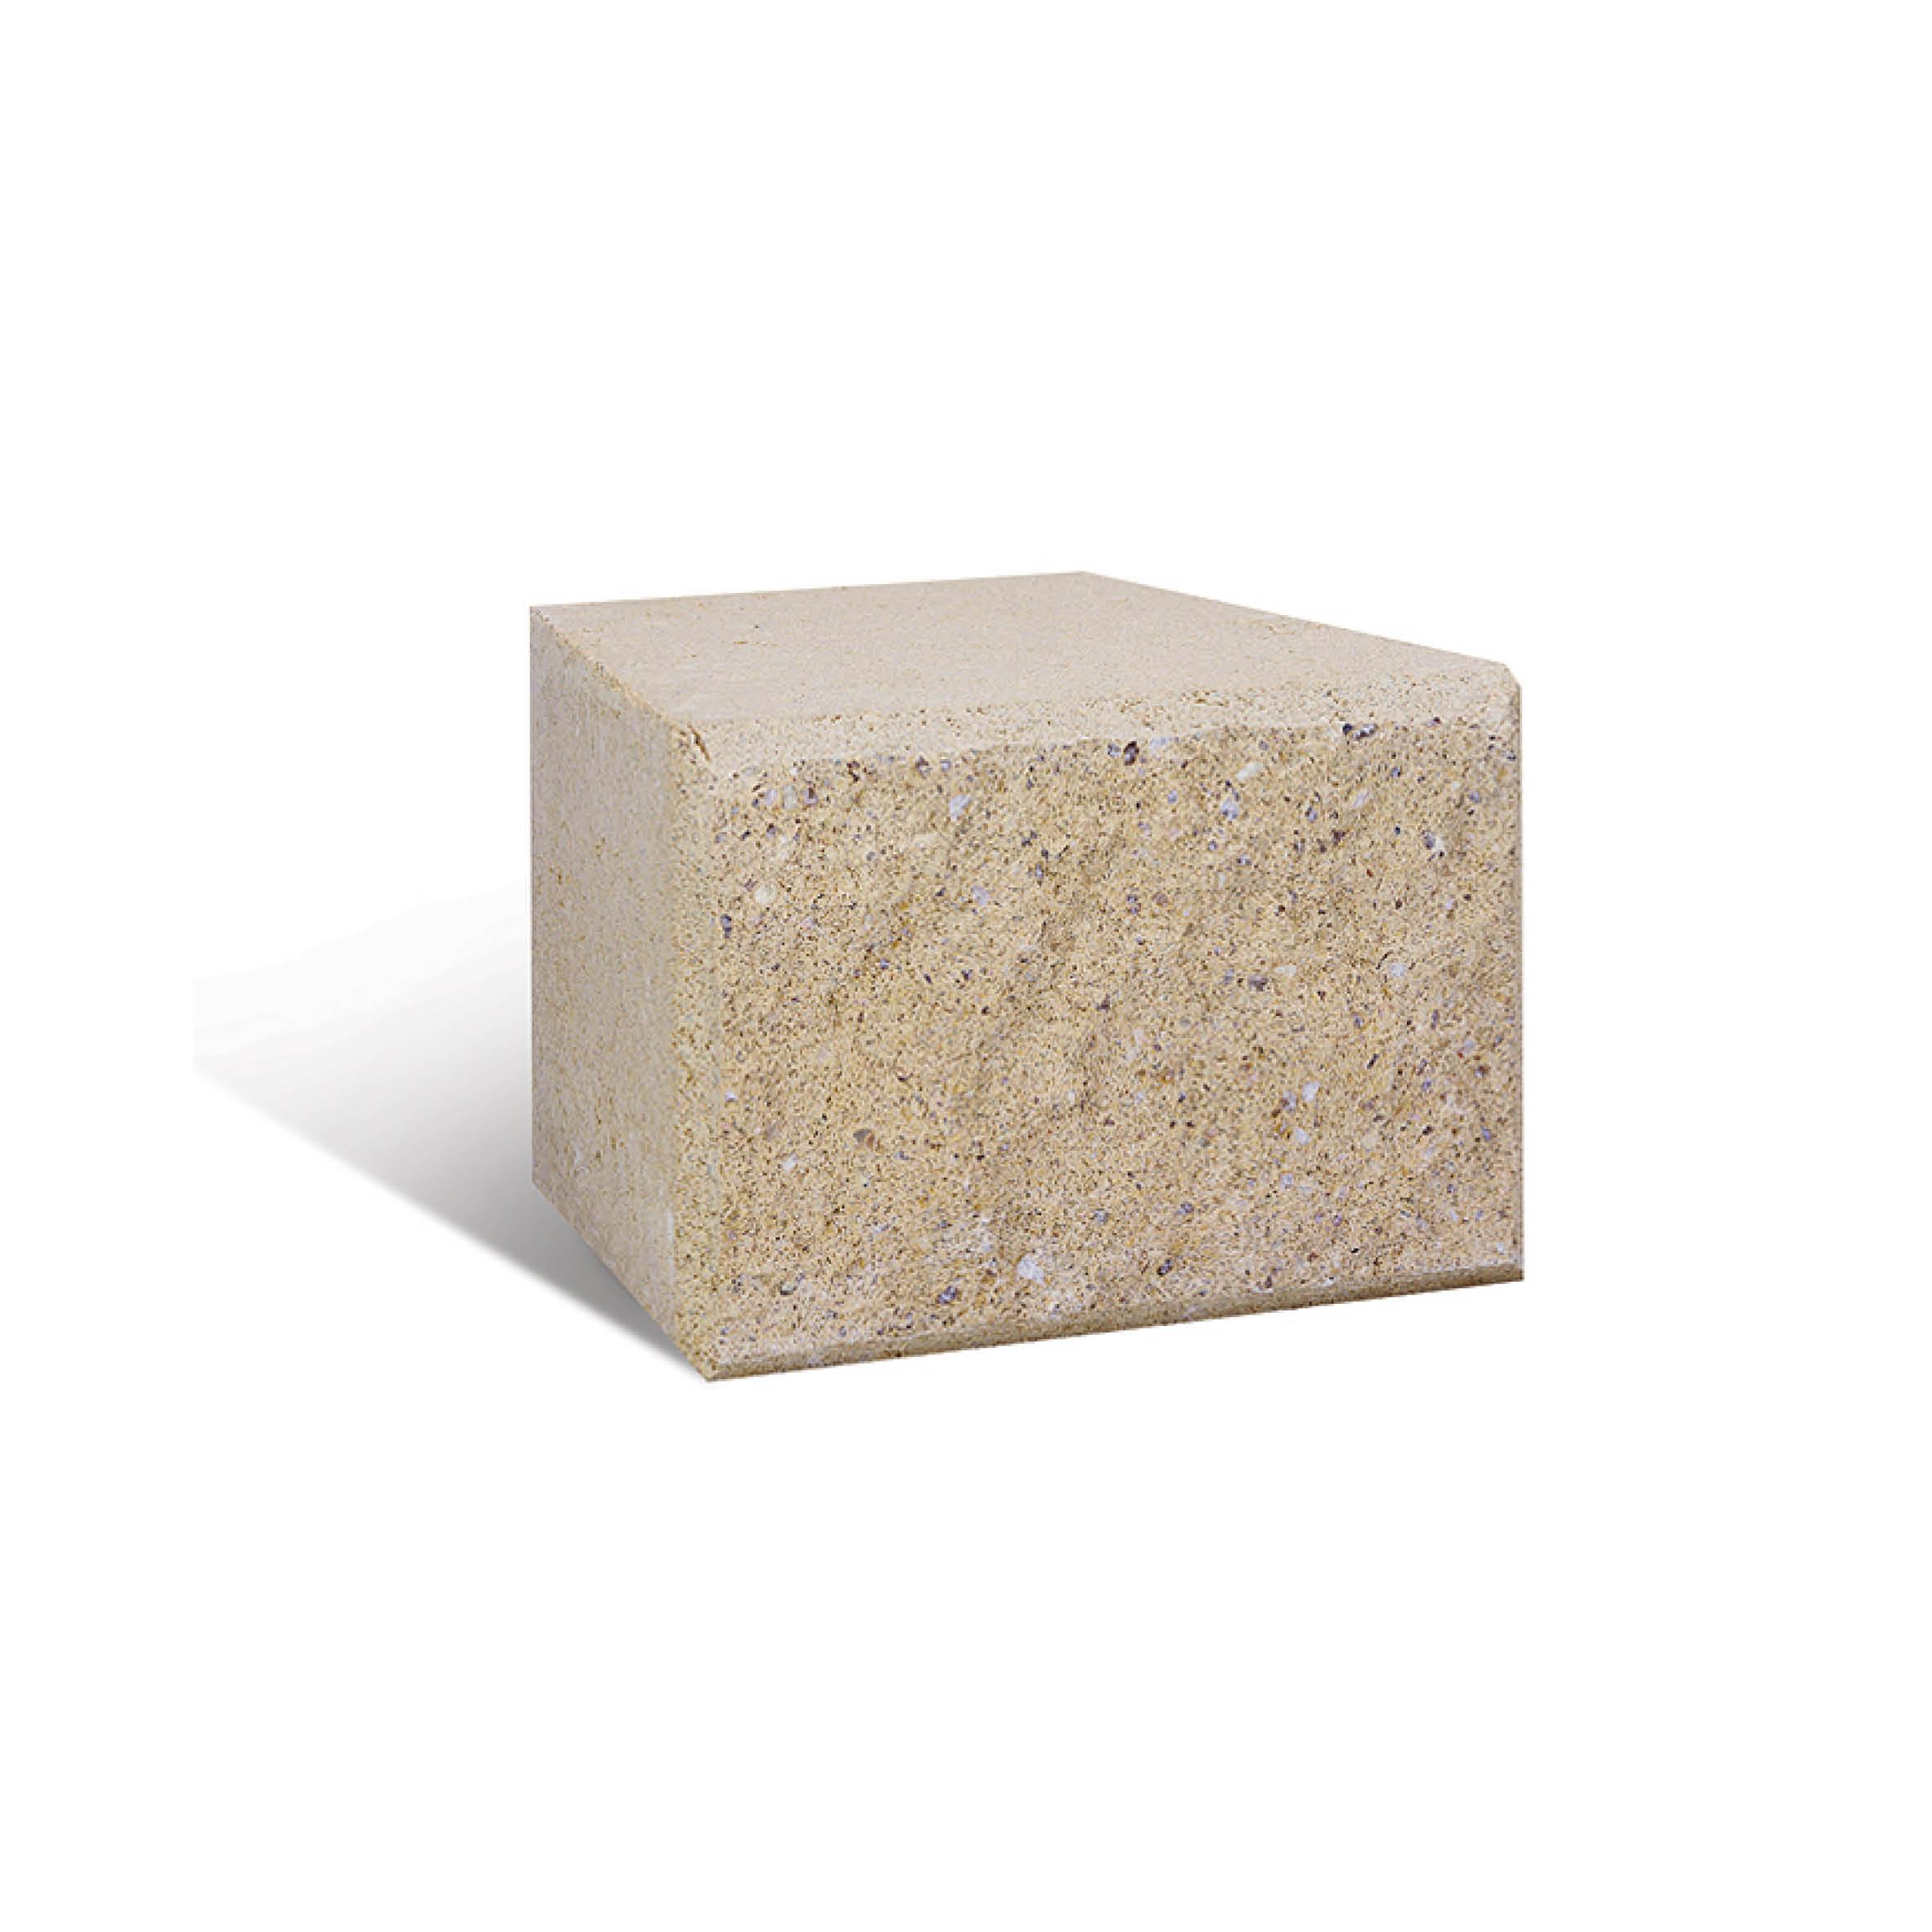 Miniwall Oatmeal